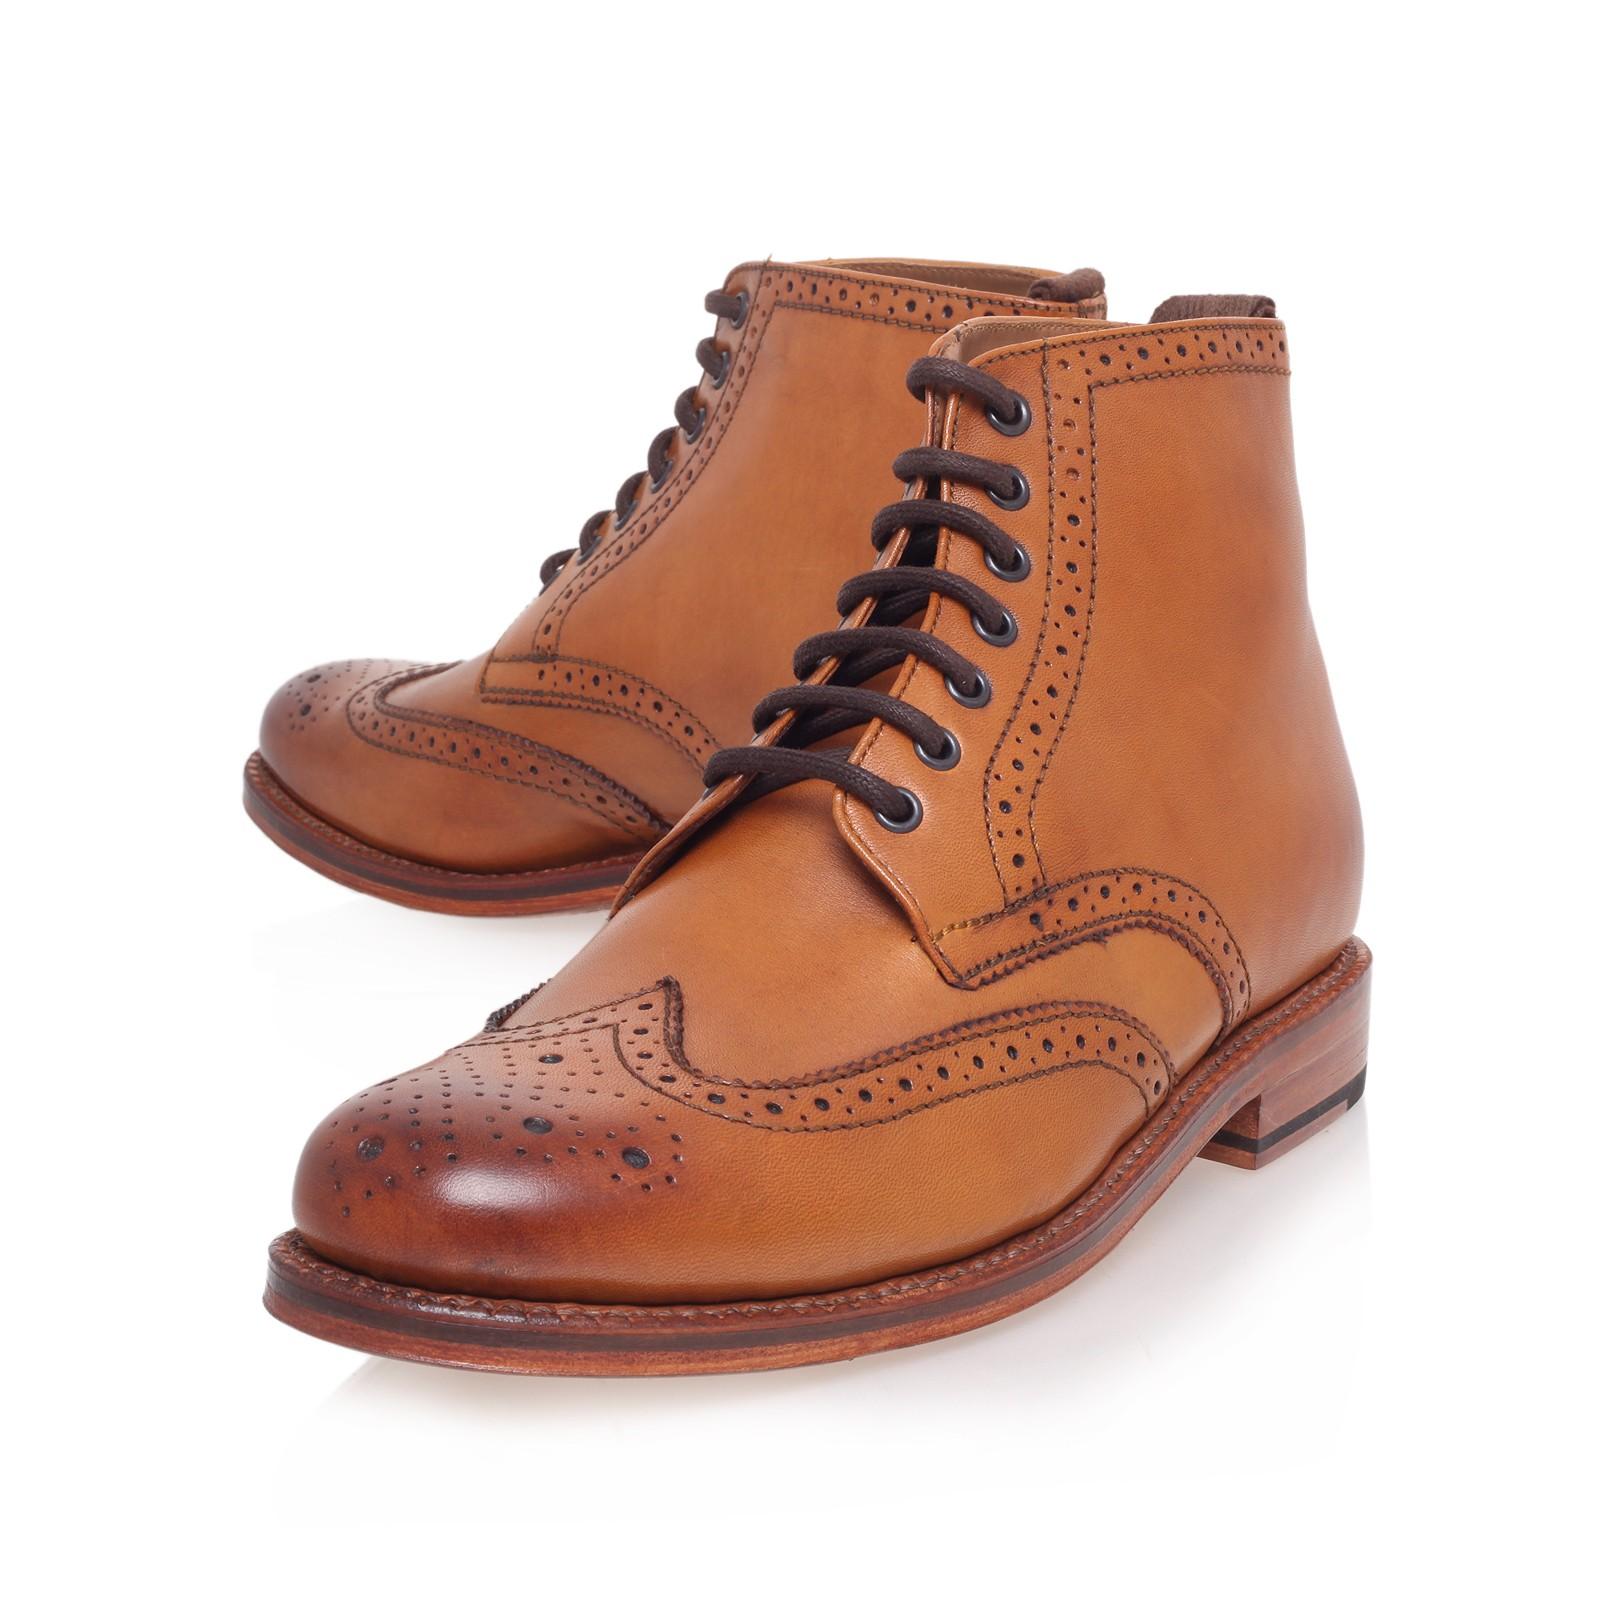 Grenson Shoes Australia